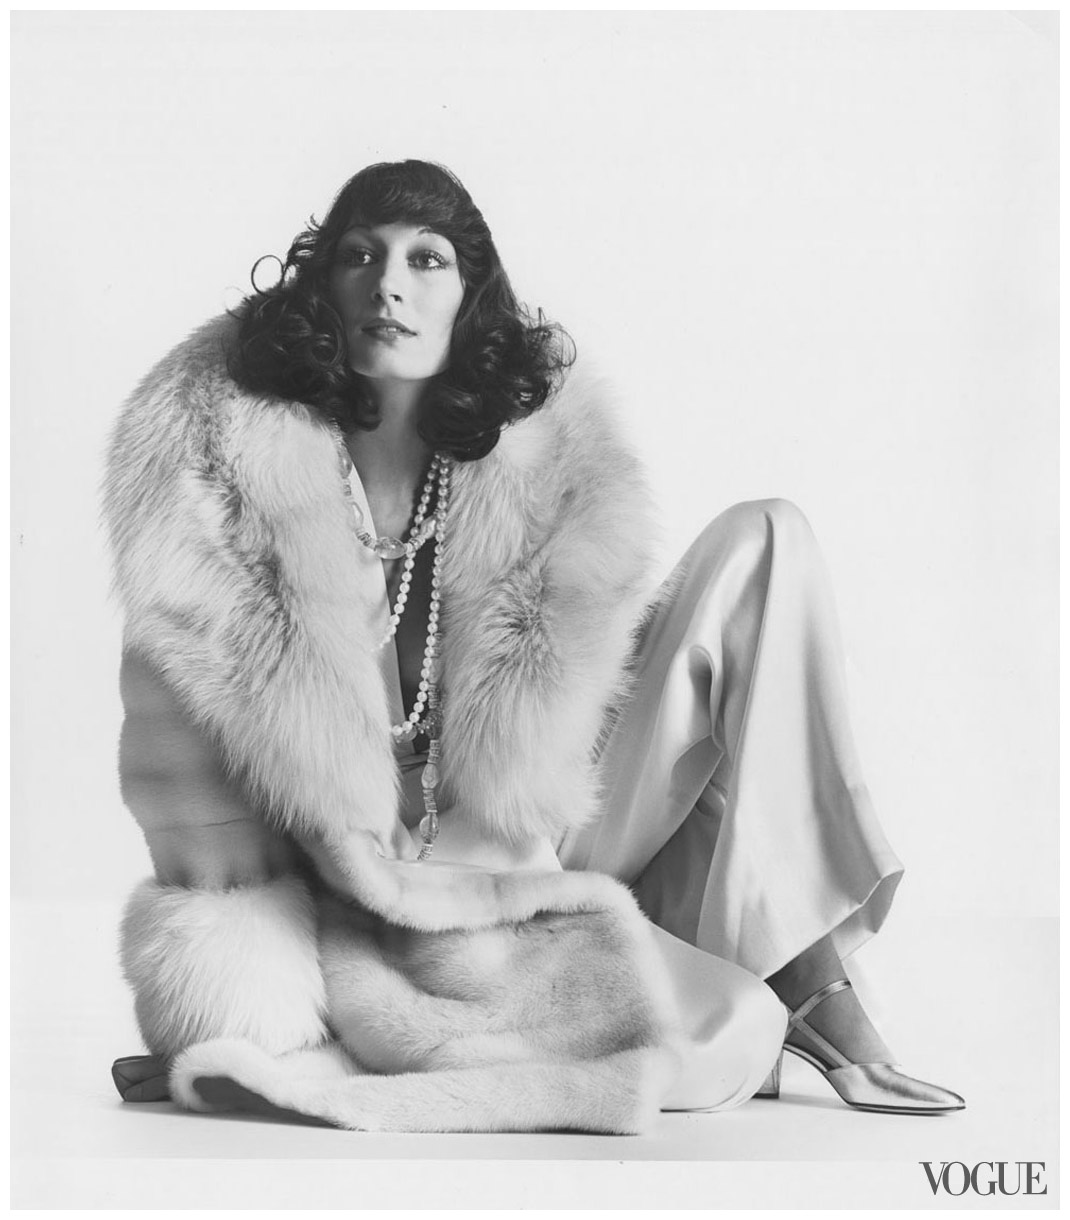 anjelica-huston-photographed-by-irving-penn-vogue-november-1-1972.jpg